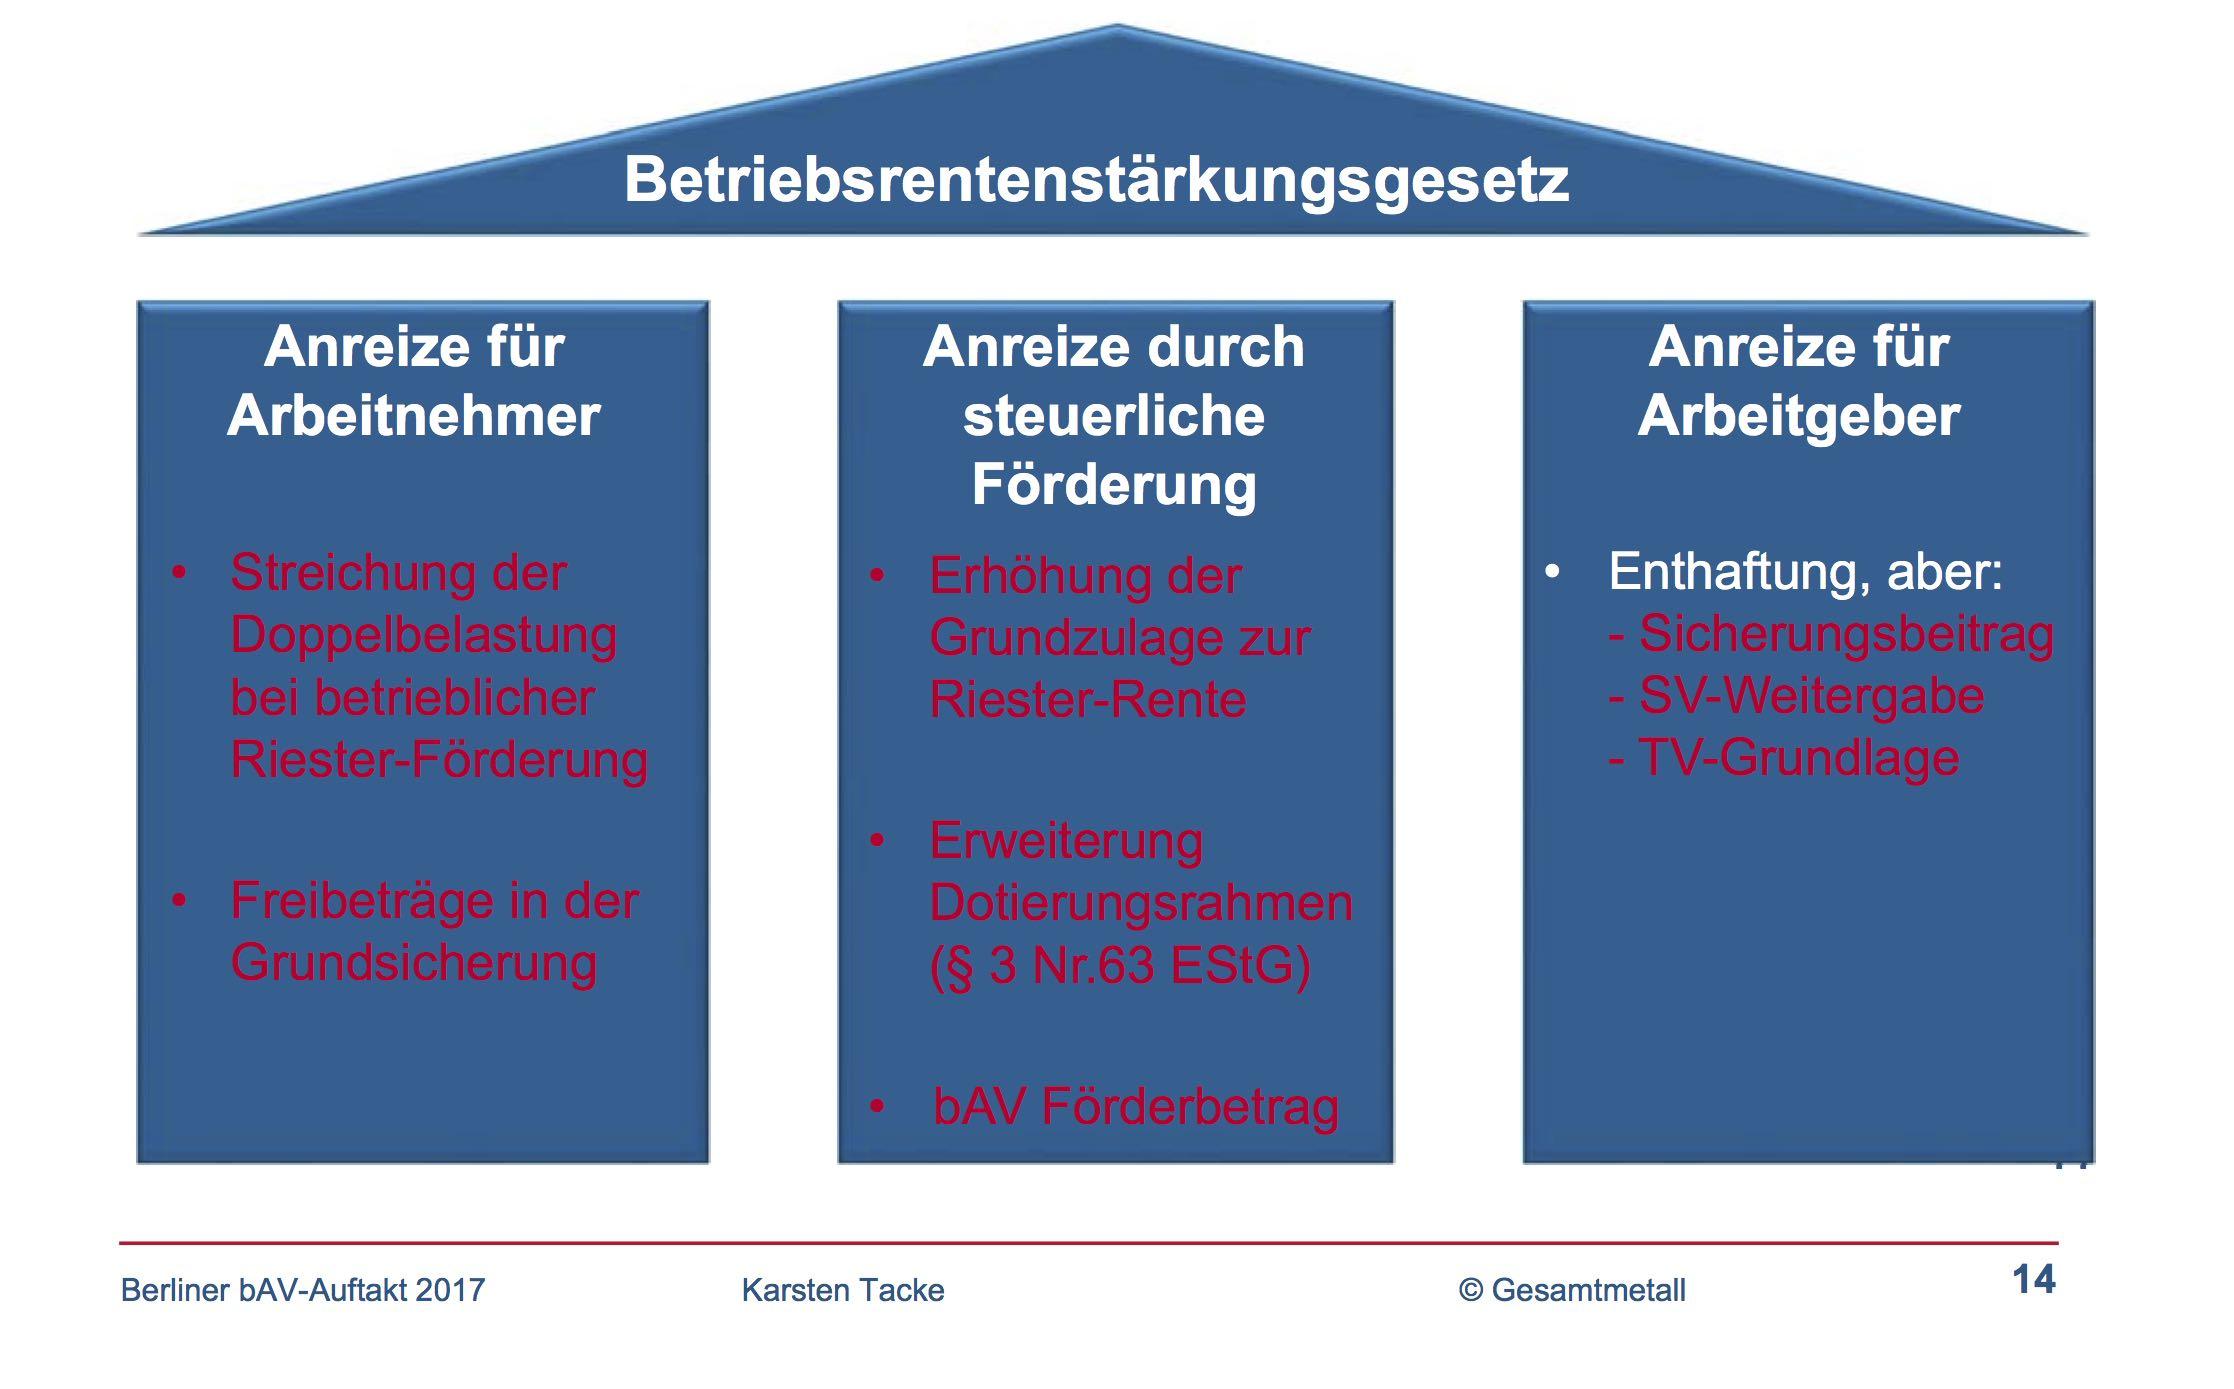 kernpunkte-praesentation-tacke-berliner-bav-auftakt-2-17-ii